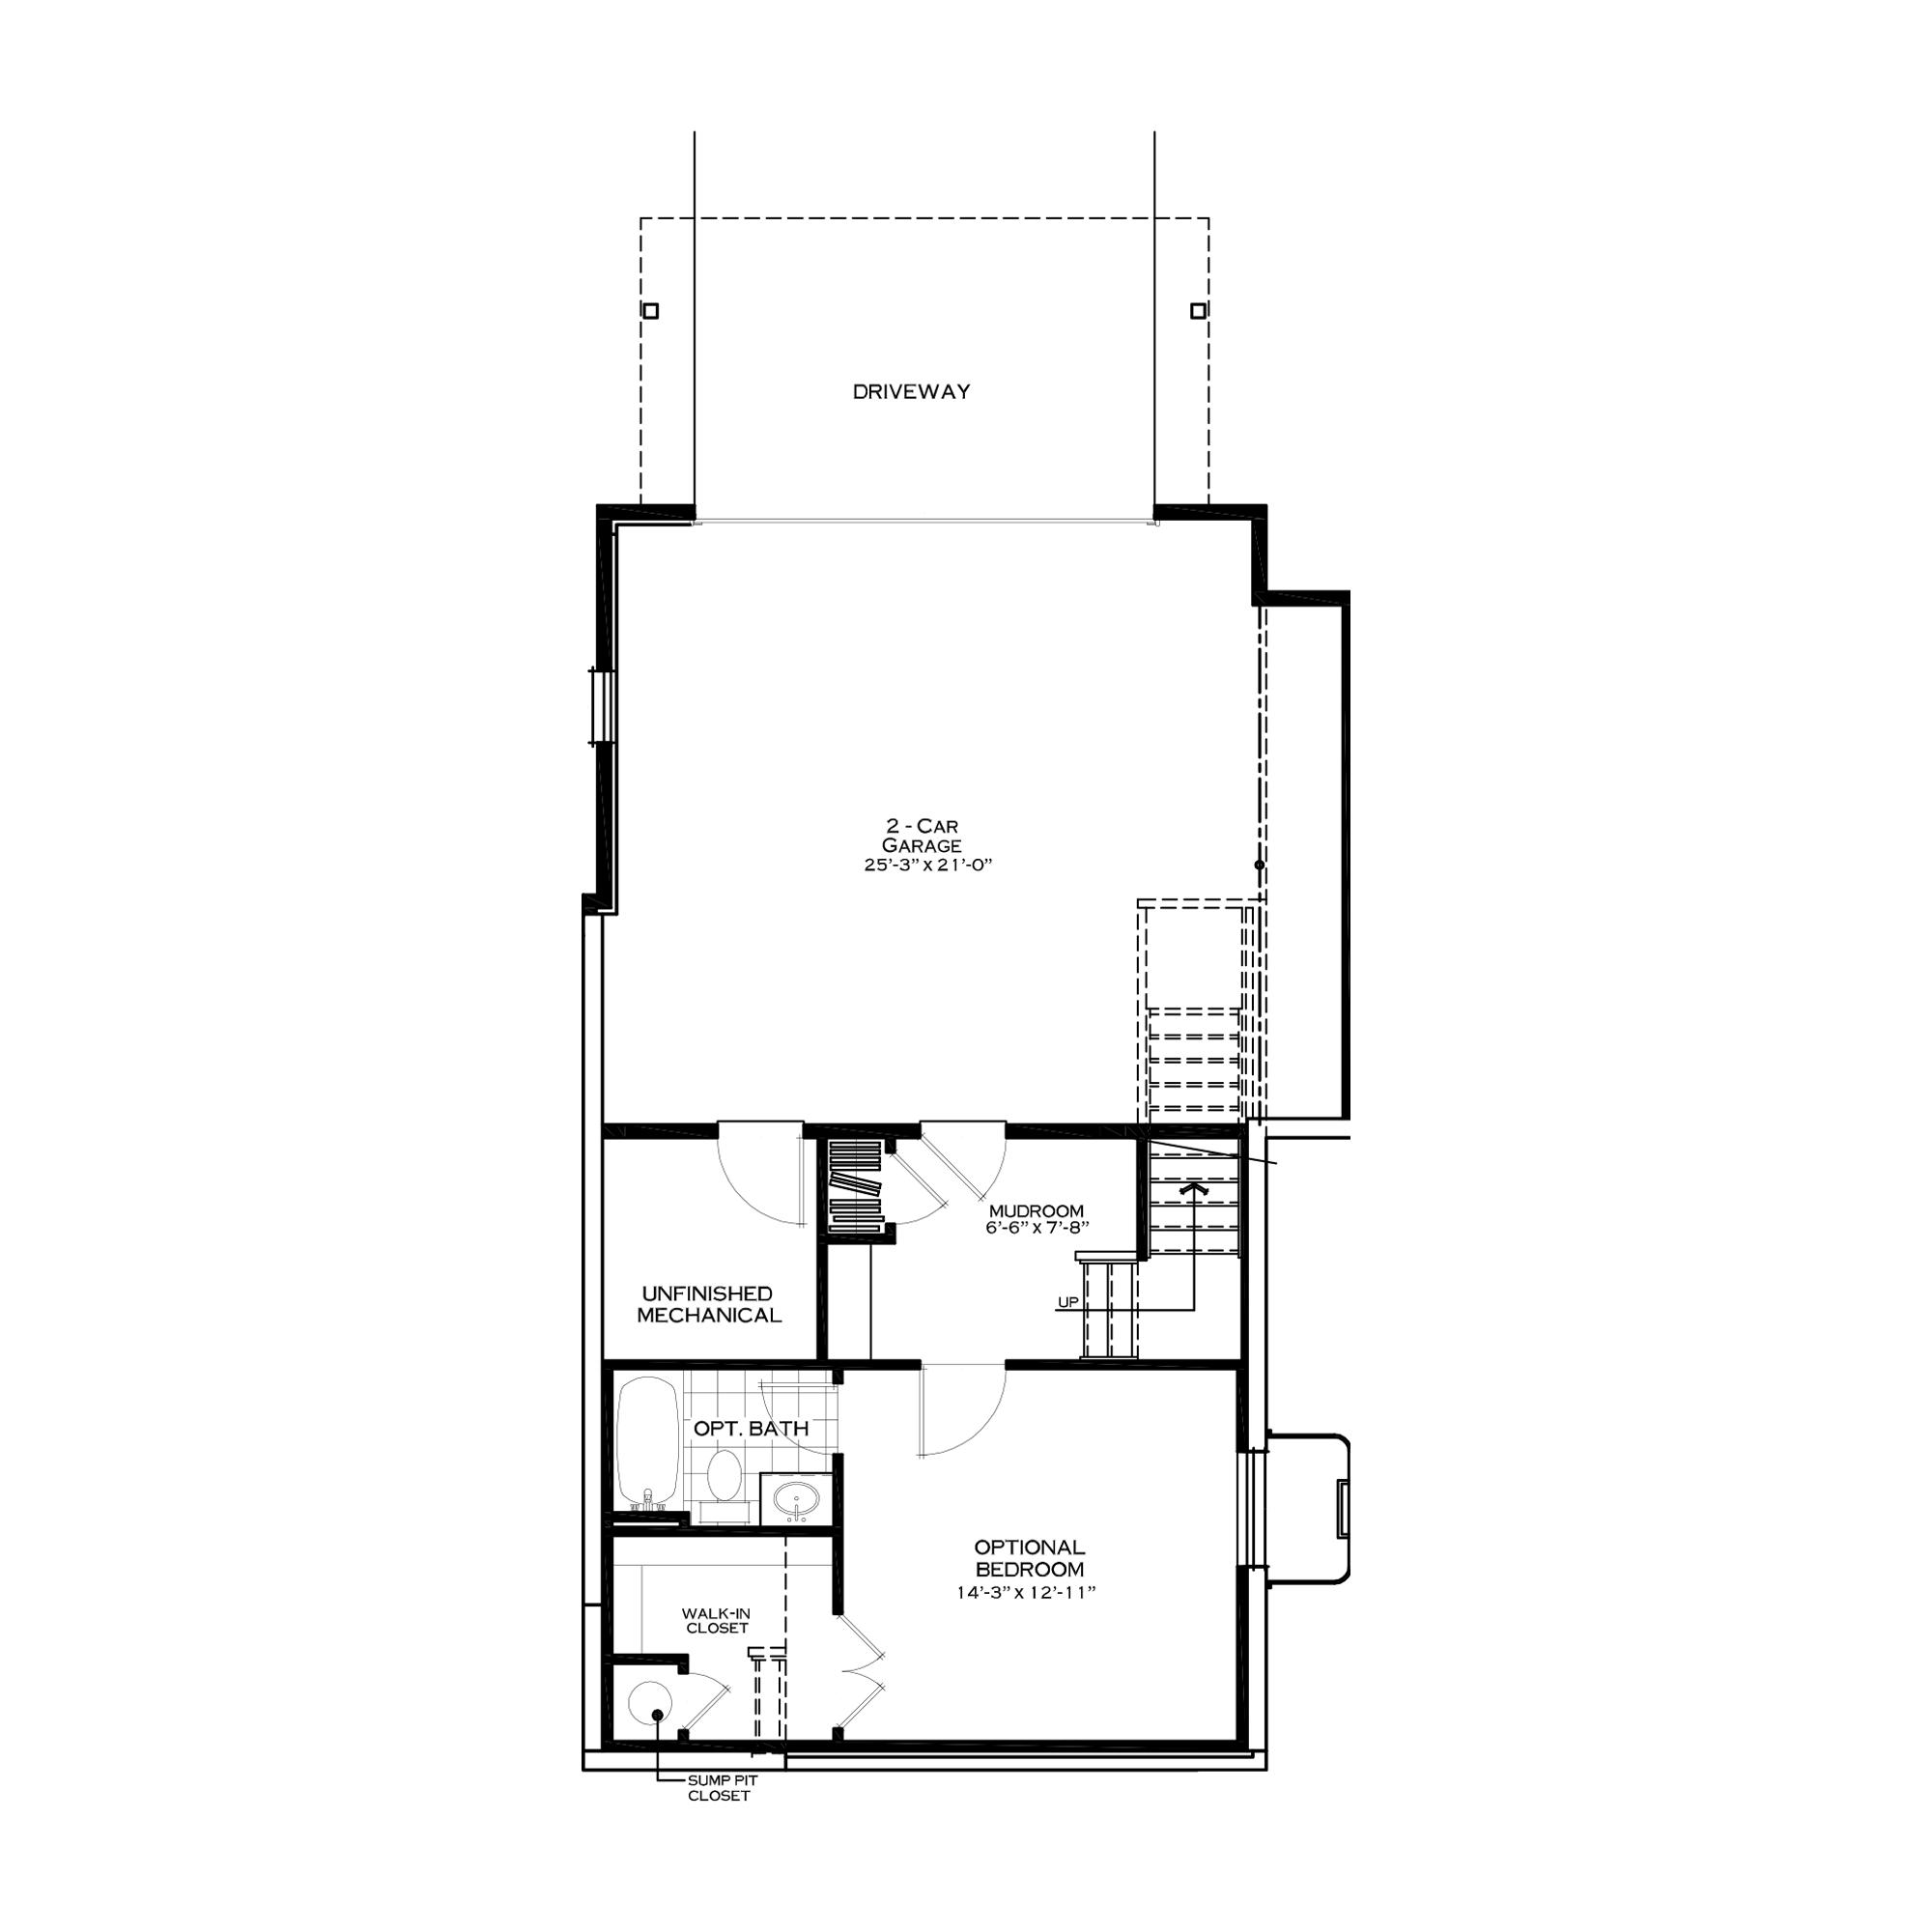 Optional First Floor with Bedroom Suite